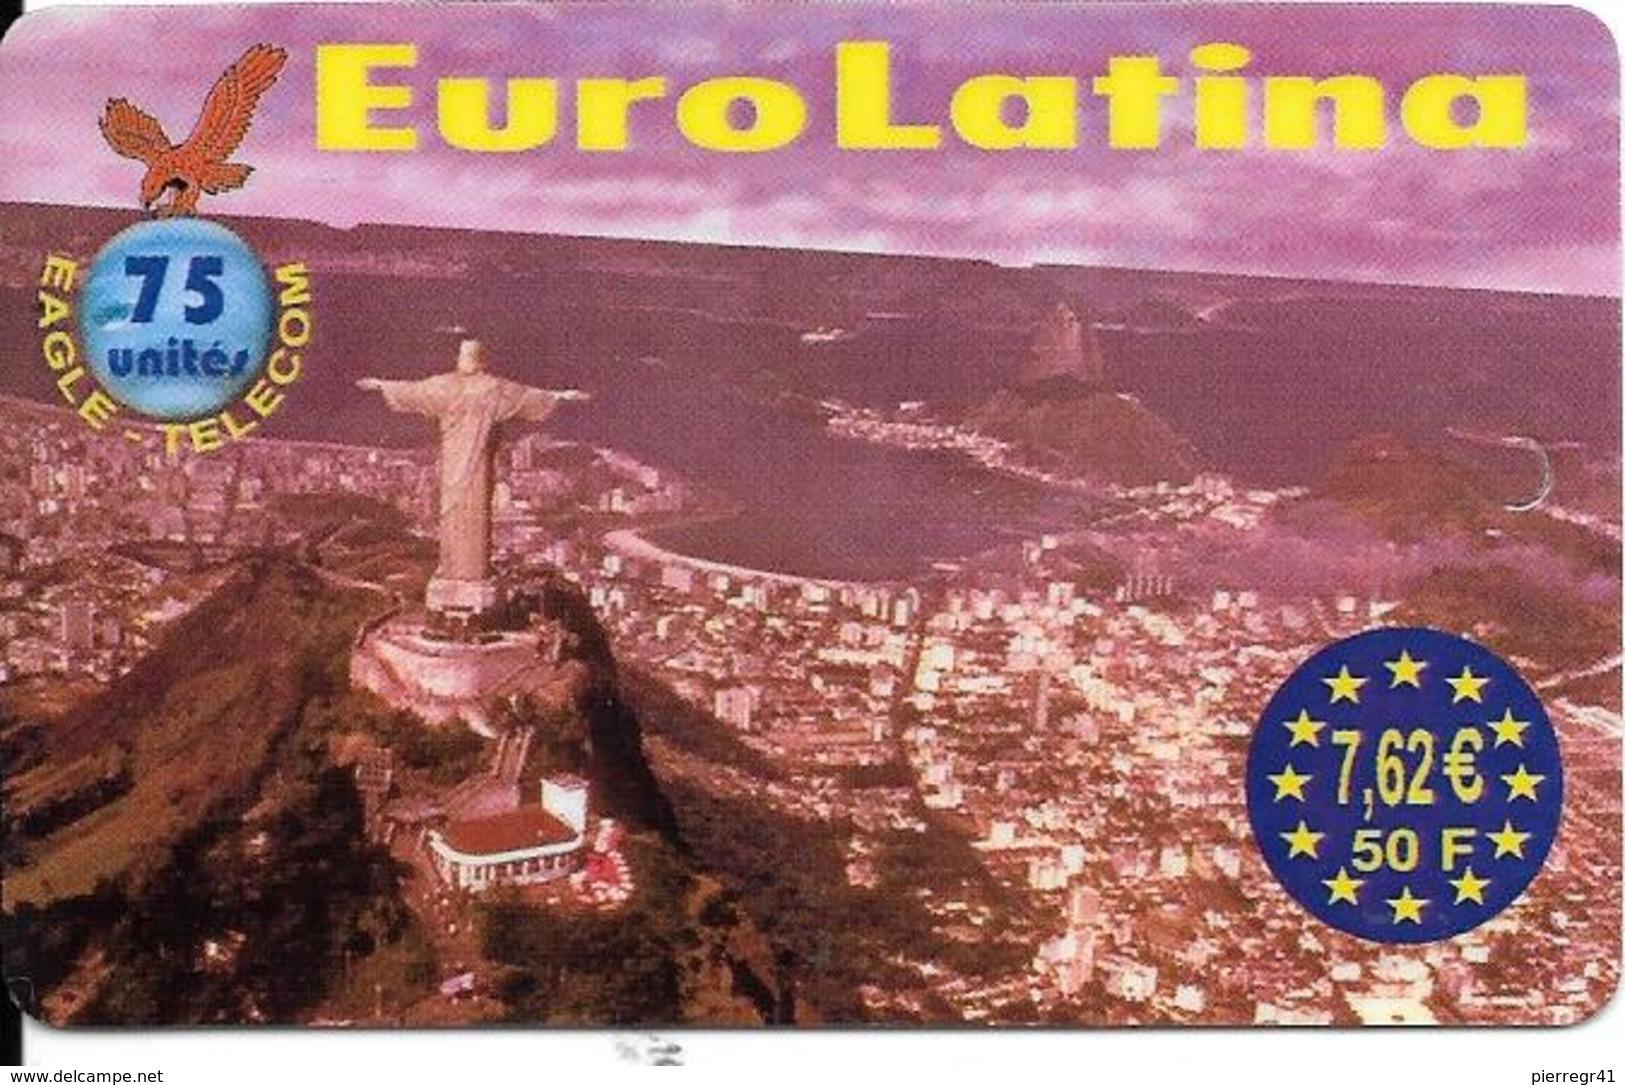 CARTE-PREPAYEE-EAGLE-75U-7.62 €-EUROLATINA-CHRIST De CORCOVADO-31/03/2004-GR ATTE- TBE - Autres Prépayées